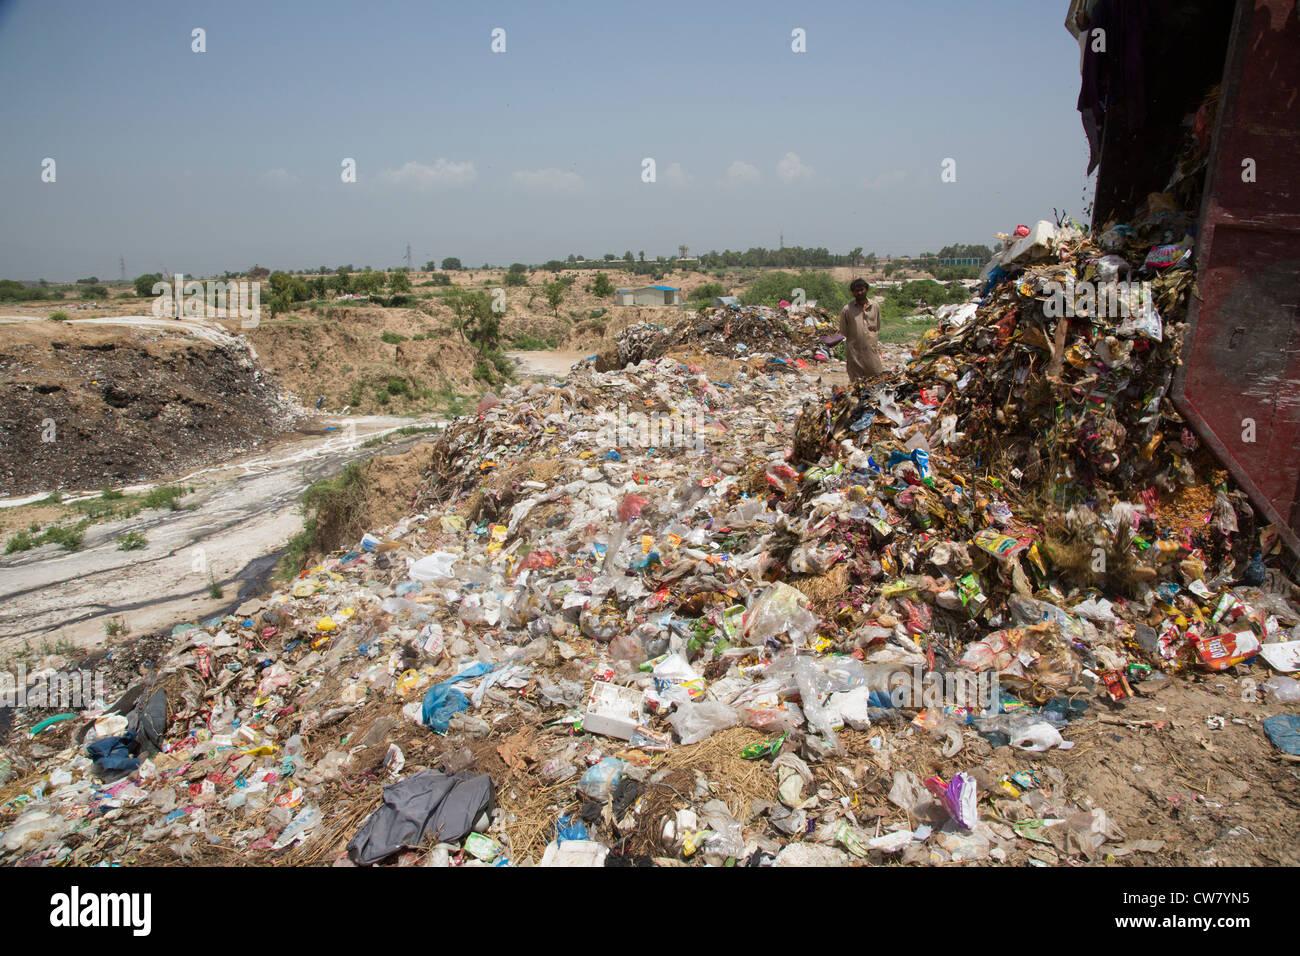 Garbage dump in Islamabad, Pakistan - Stock Image